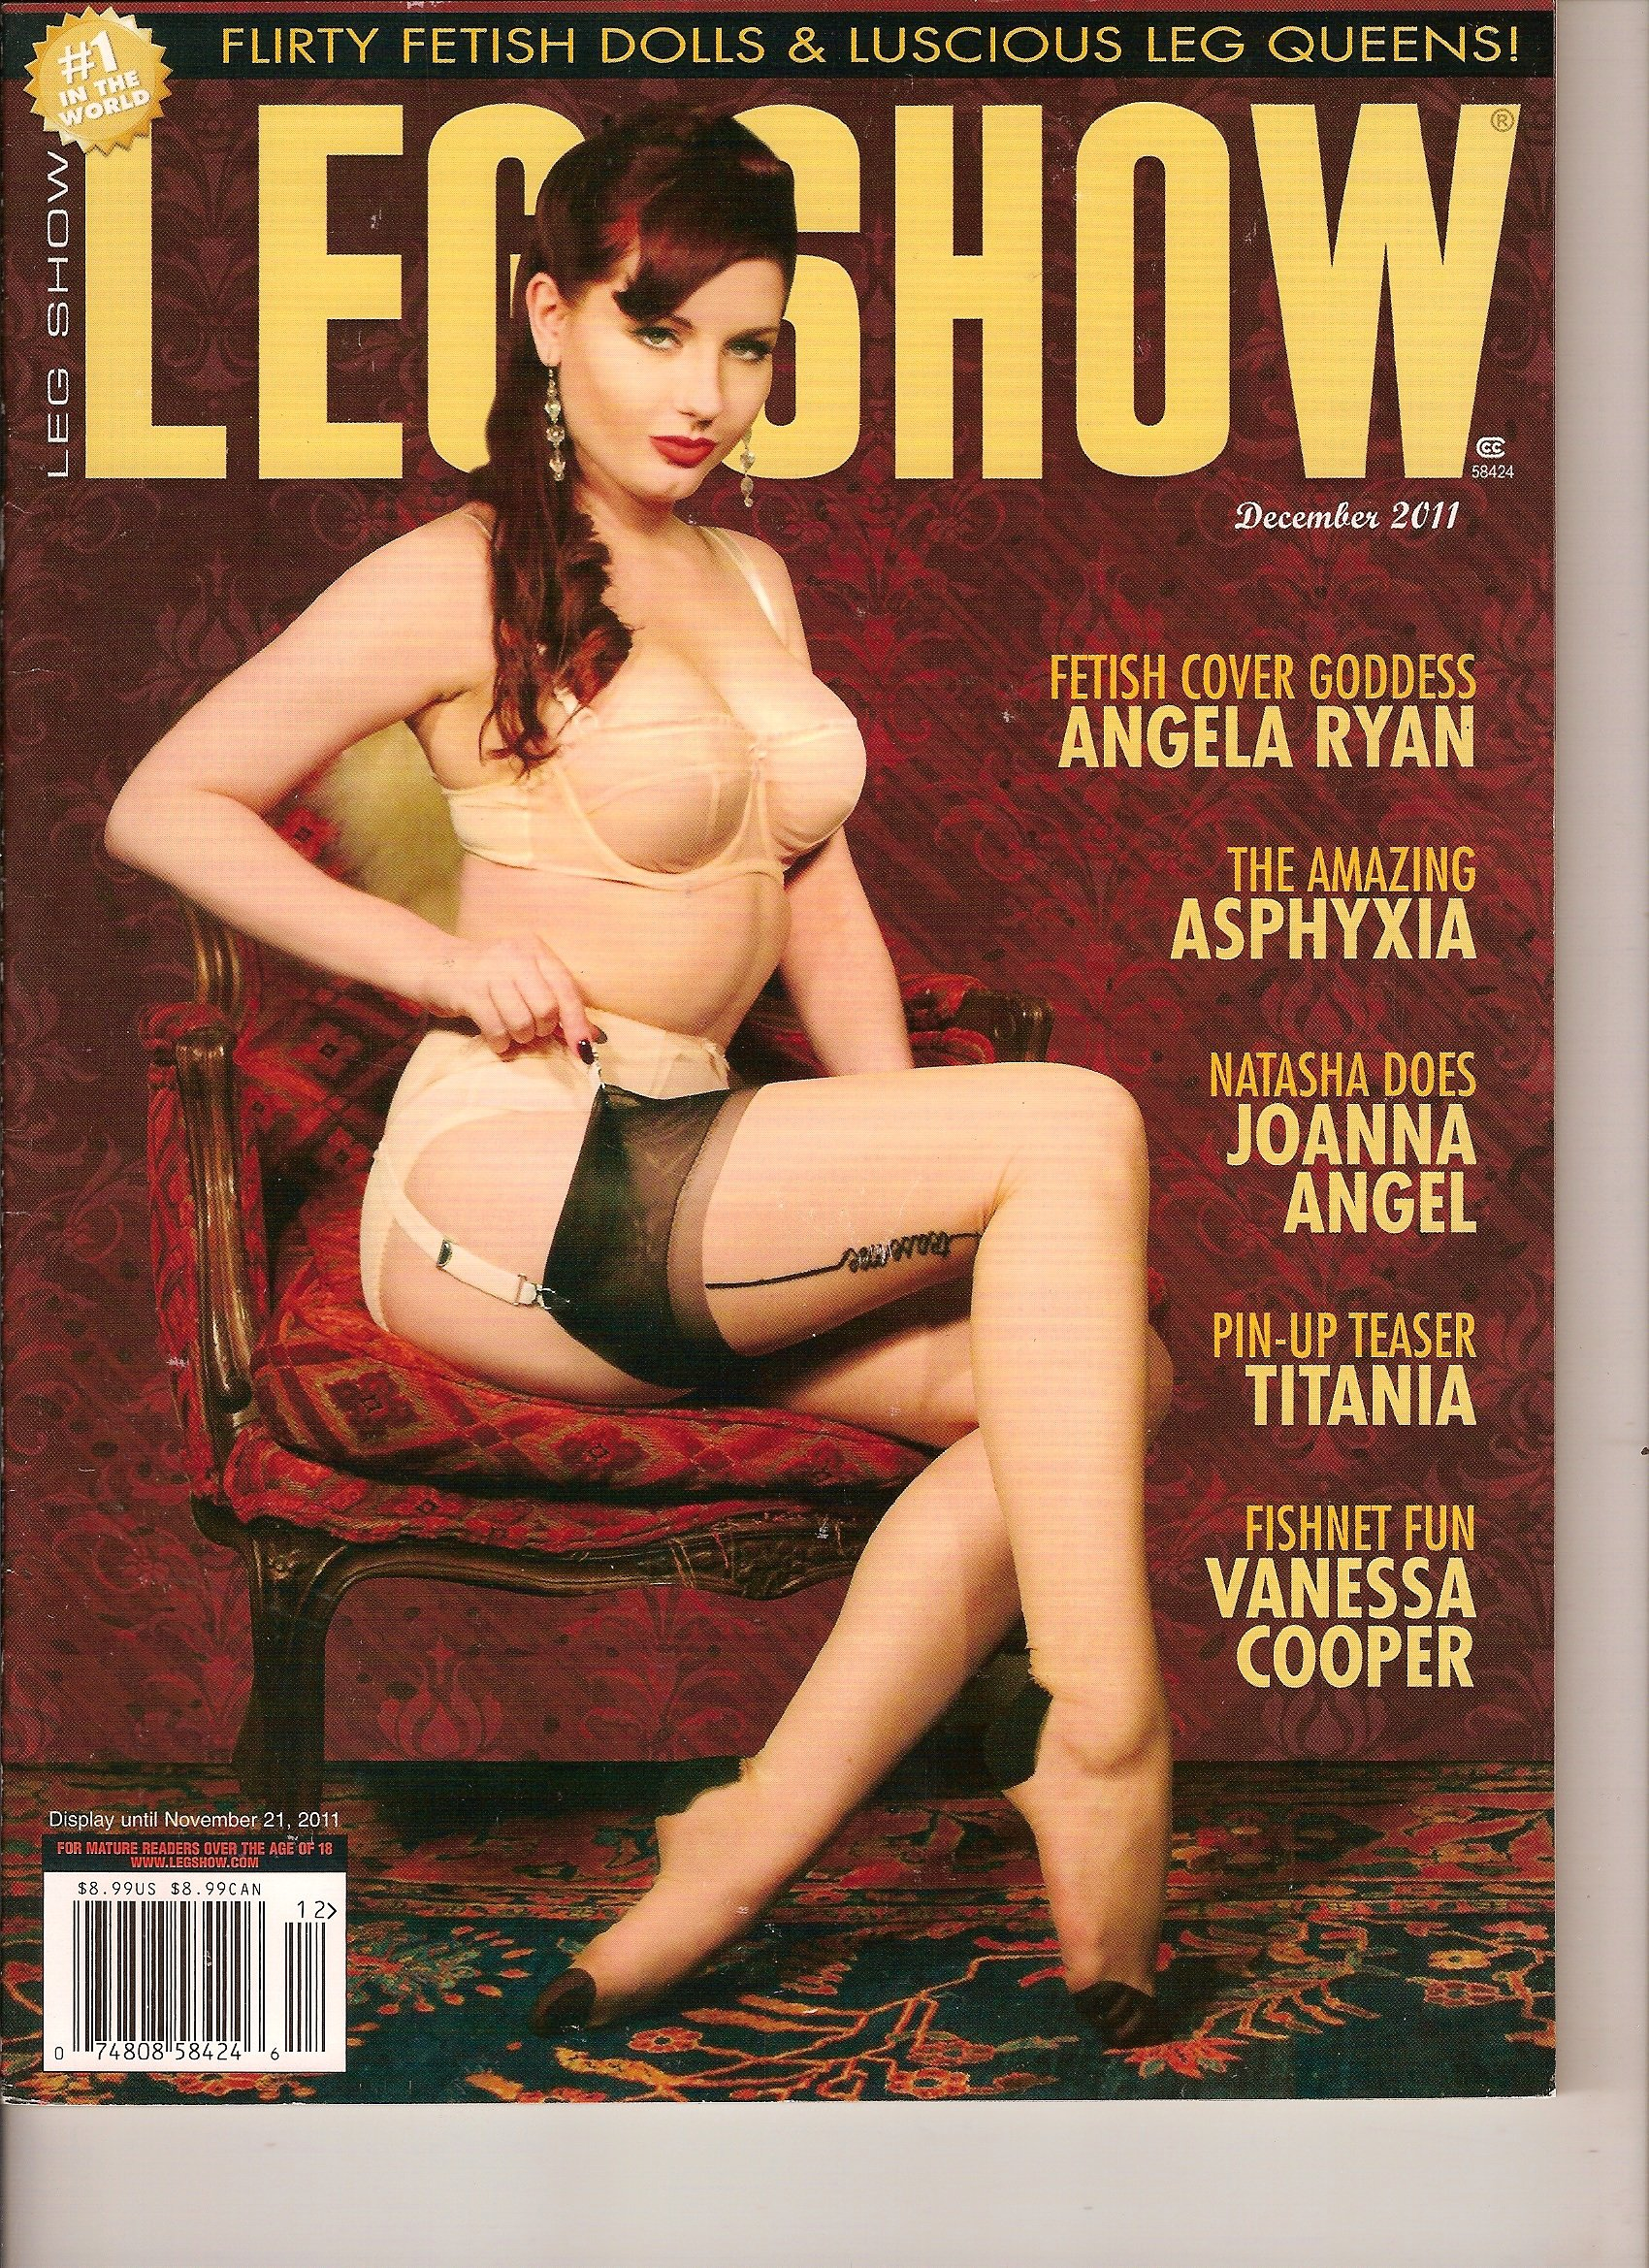 Angela Ryan Leg Show